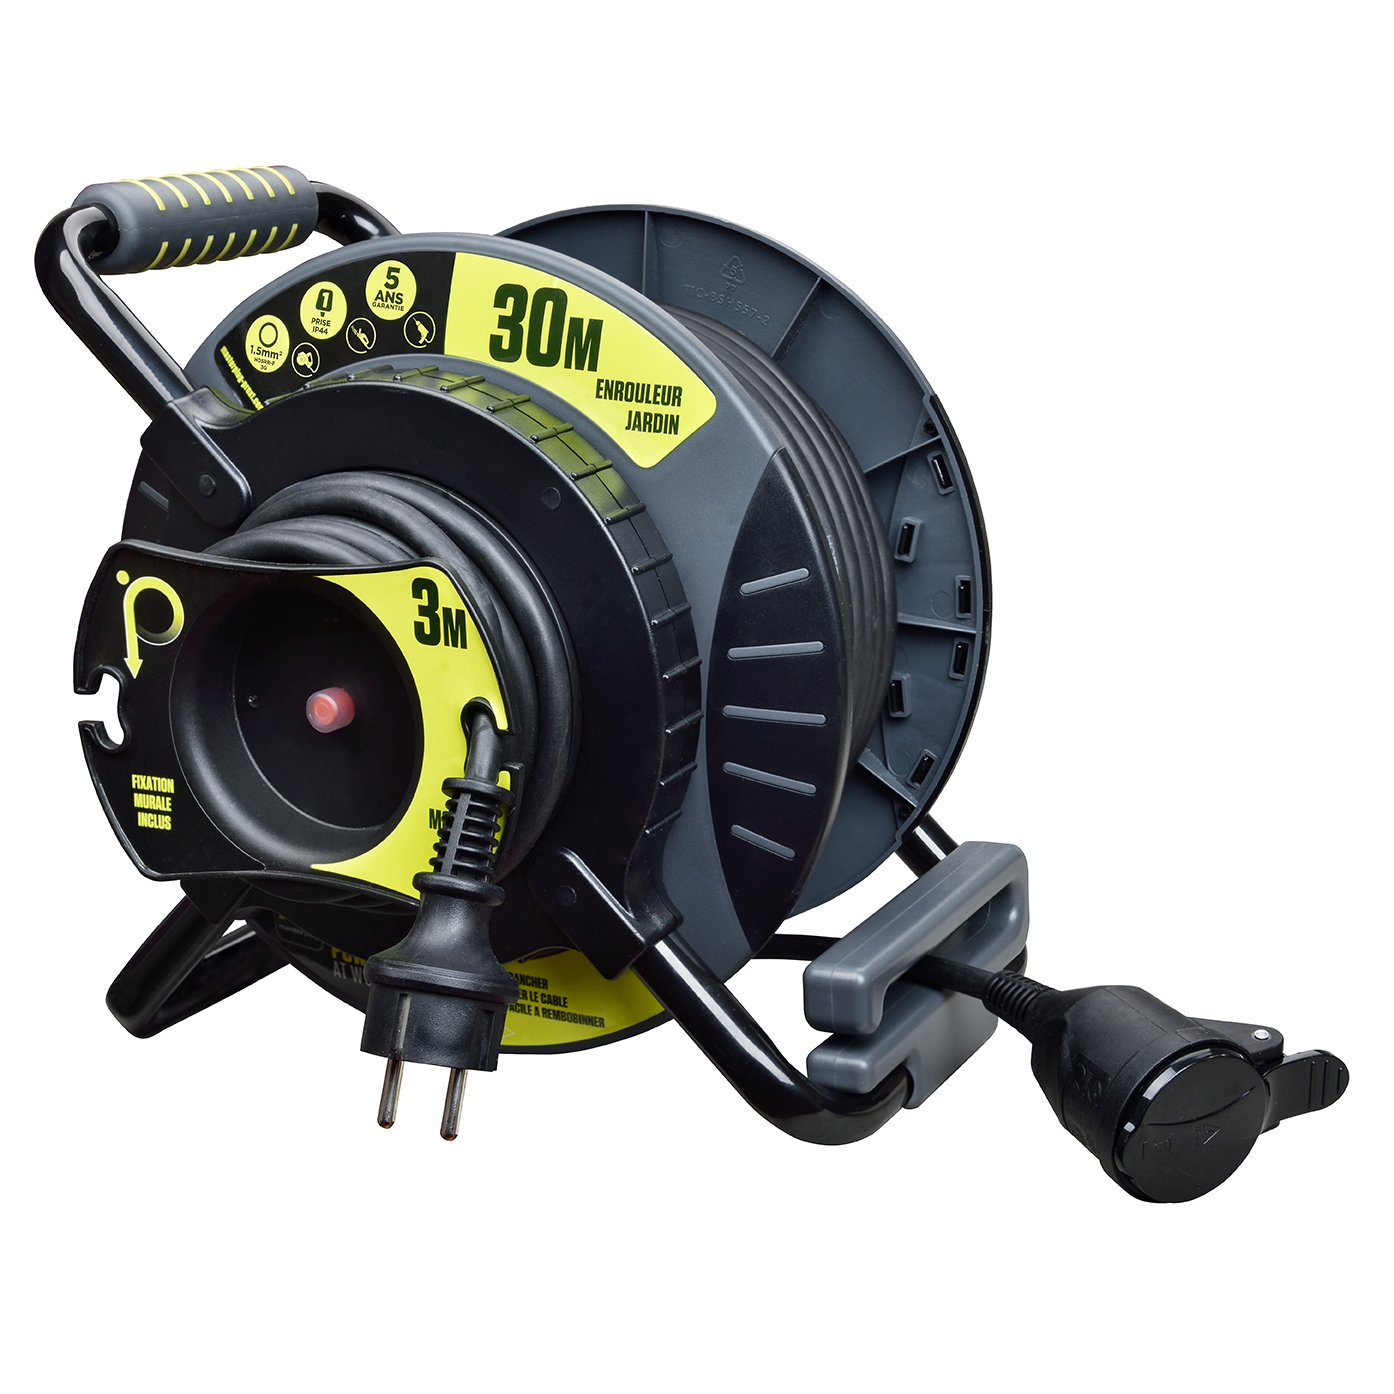 Masterplug oatrf3016rrfl3ip-px avvolgicavo elettrico di giardino, 3000W, 230V, Nero/Giallo 3000W 230V Luceco